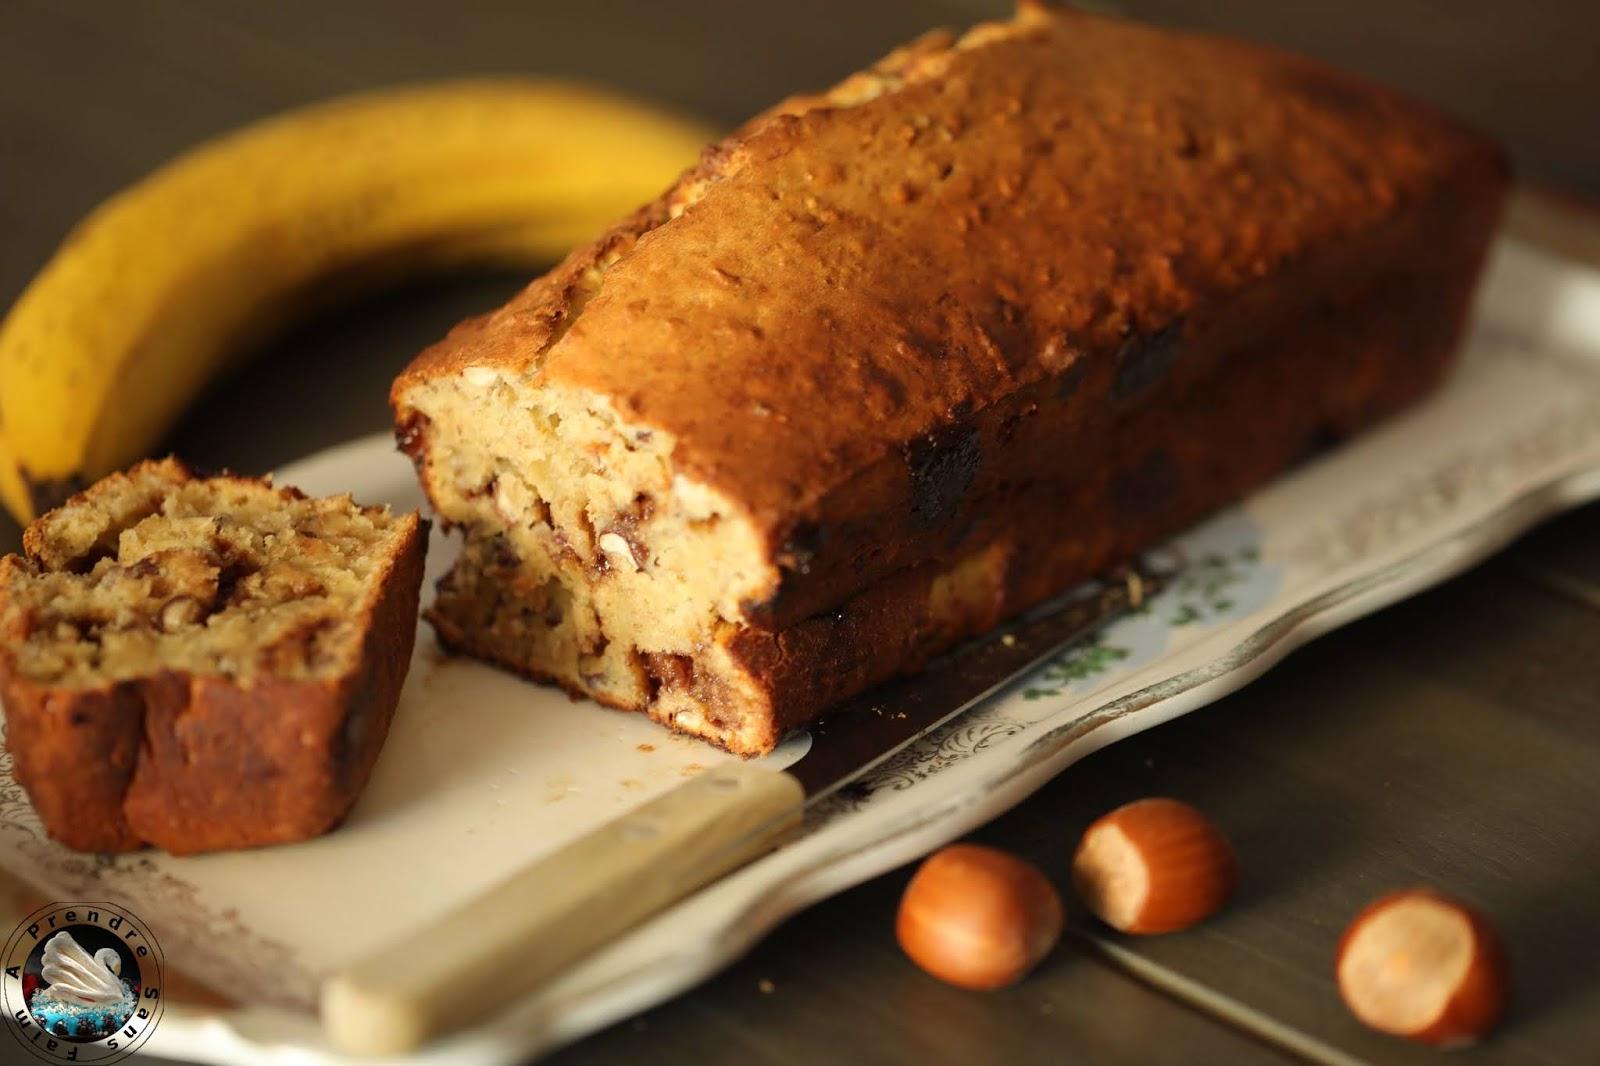 Banana bread choco noisettes aux flocons